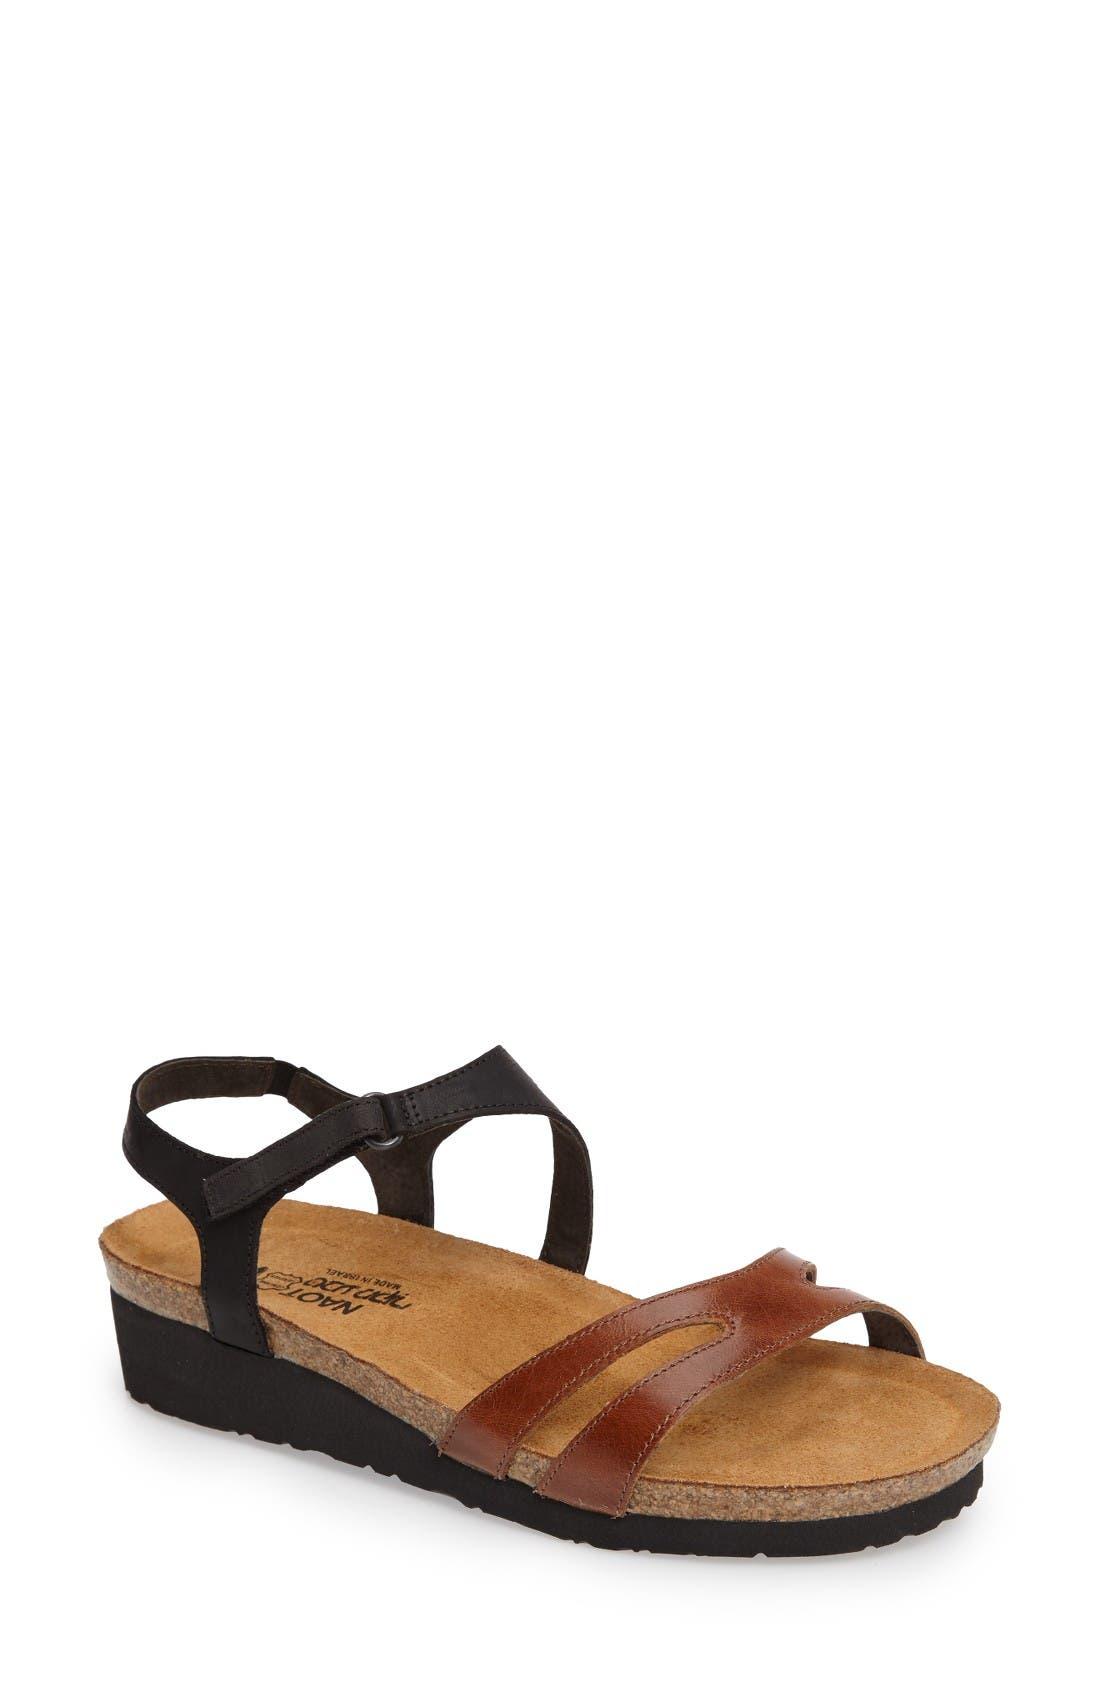 Janis Sandal,                             Main thumbnail 1, color,                             Brown/ Black Leather